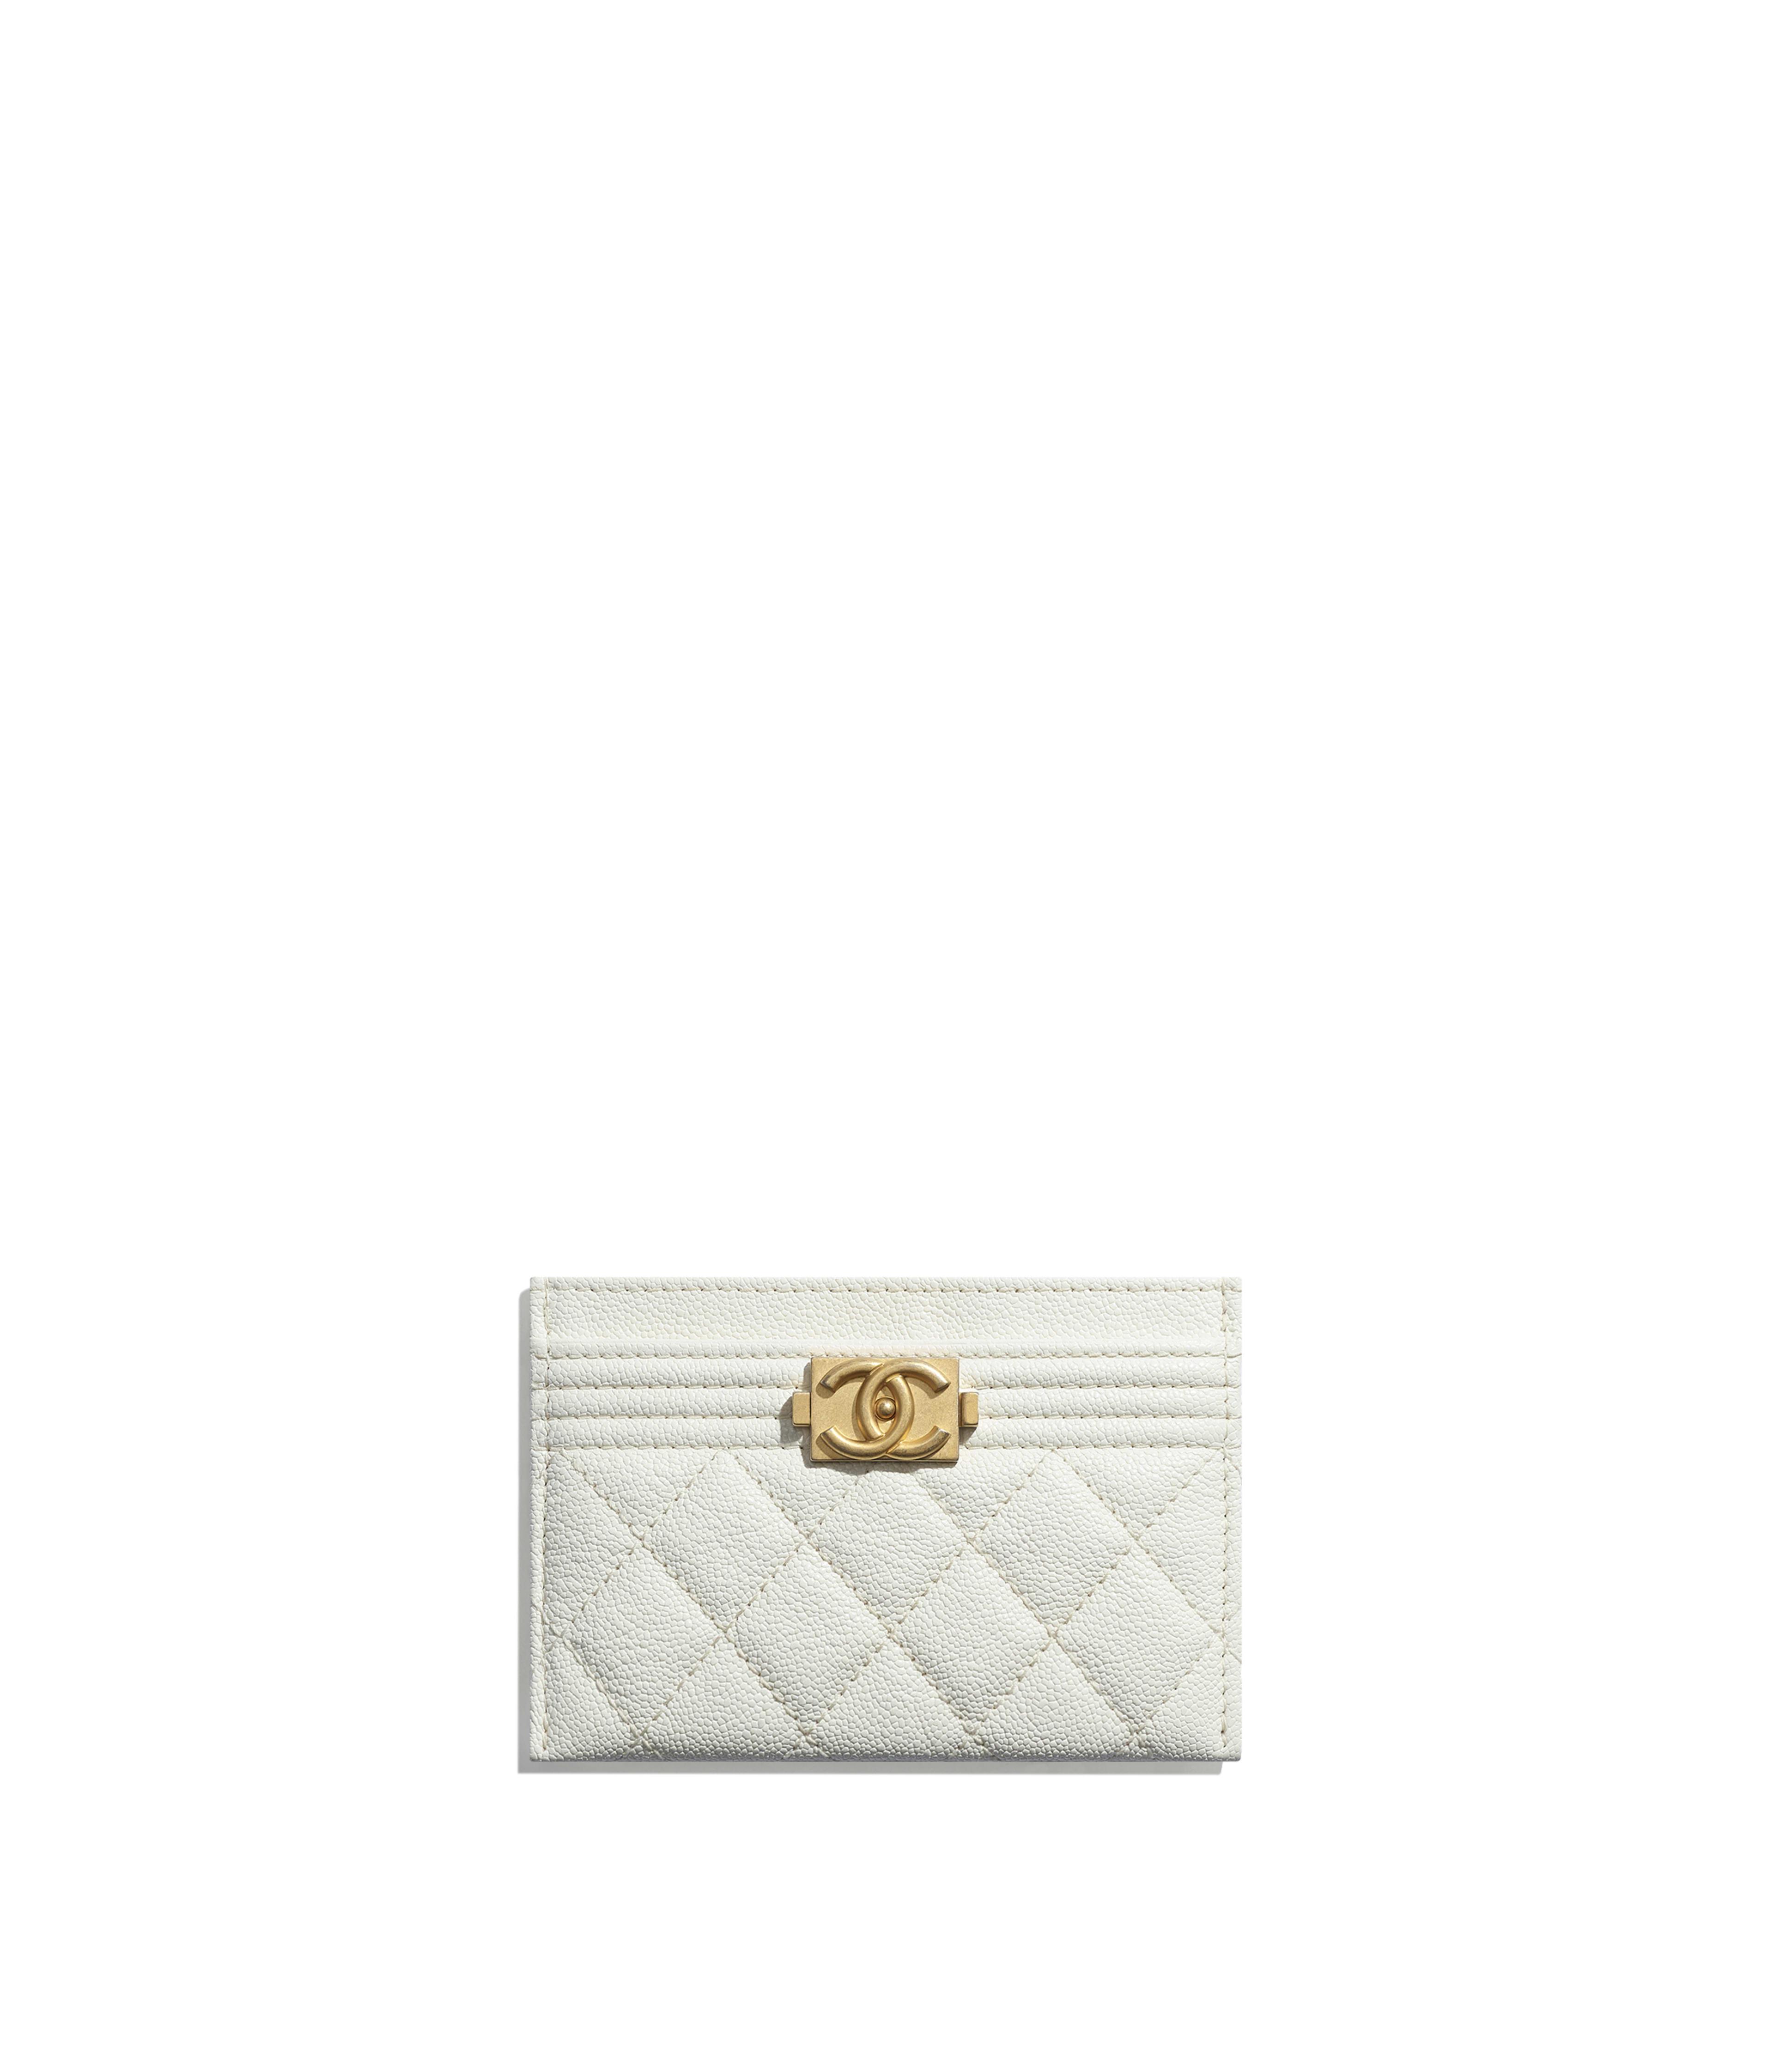 45aa063fdd4fea BOY CHANEL Card Holder Grained Calfskin & Gold-Tone Metal, White Ref.  A84431Y8362110601